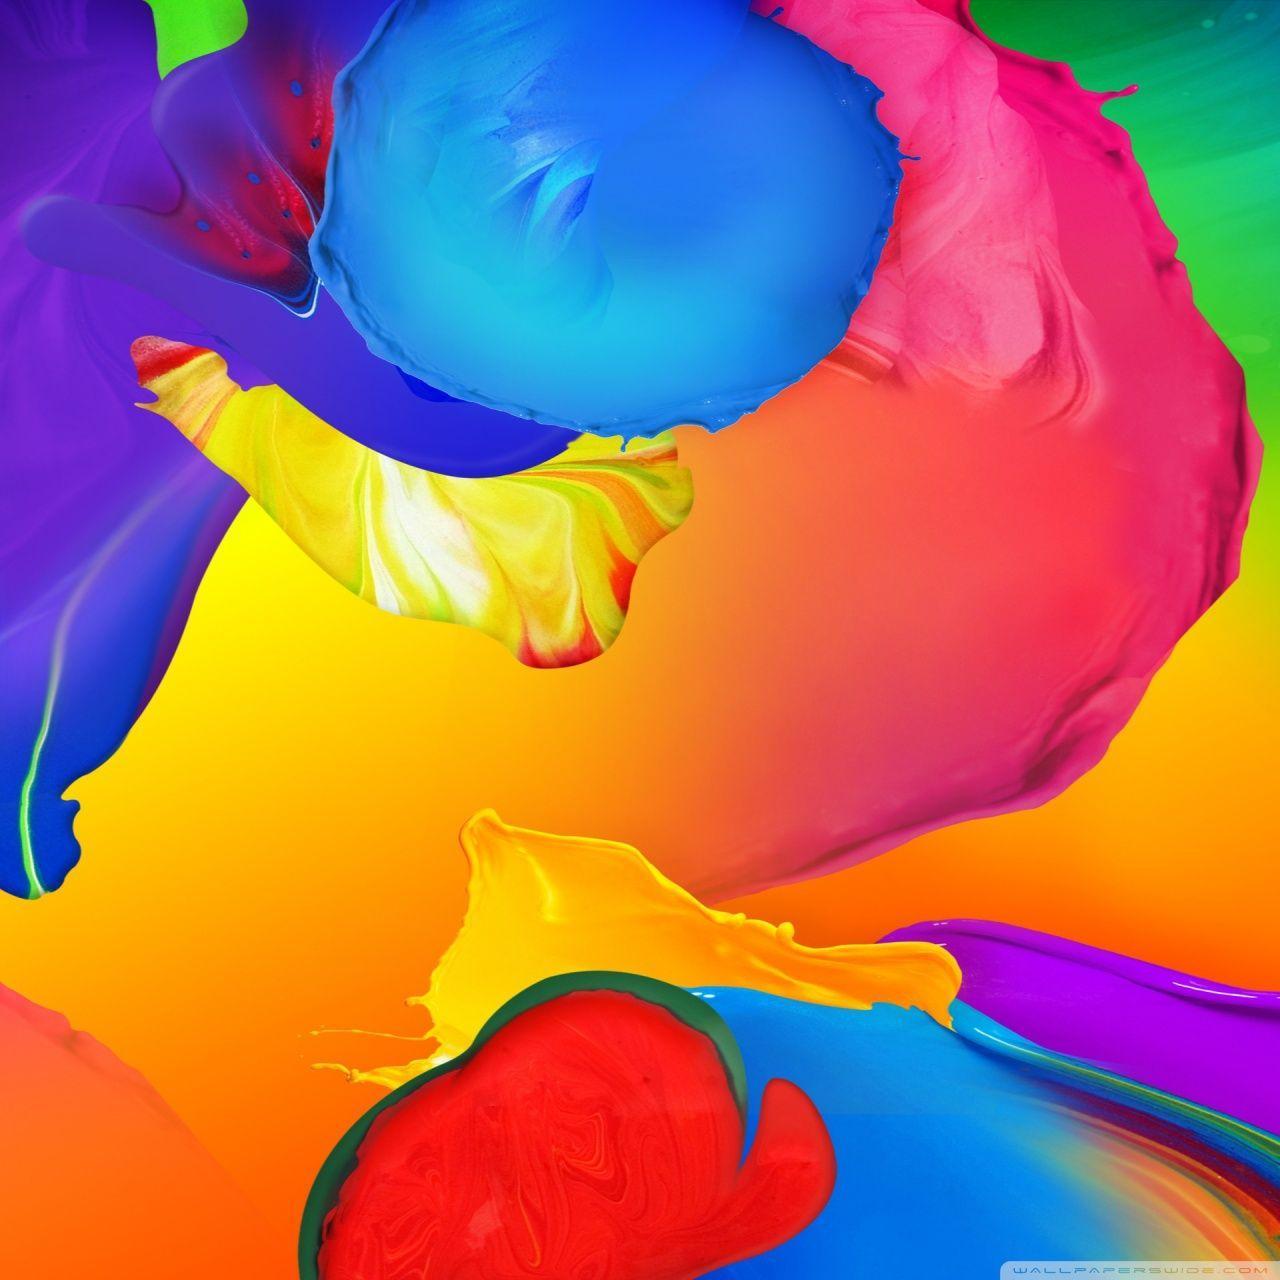 Samsung Tablet Backgrounds Wallpaper Cave